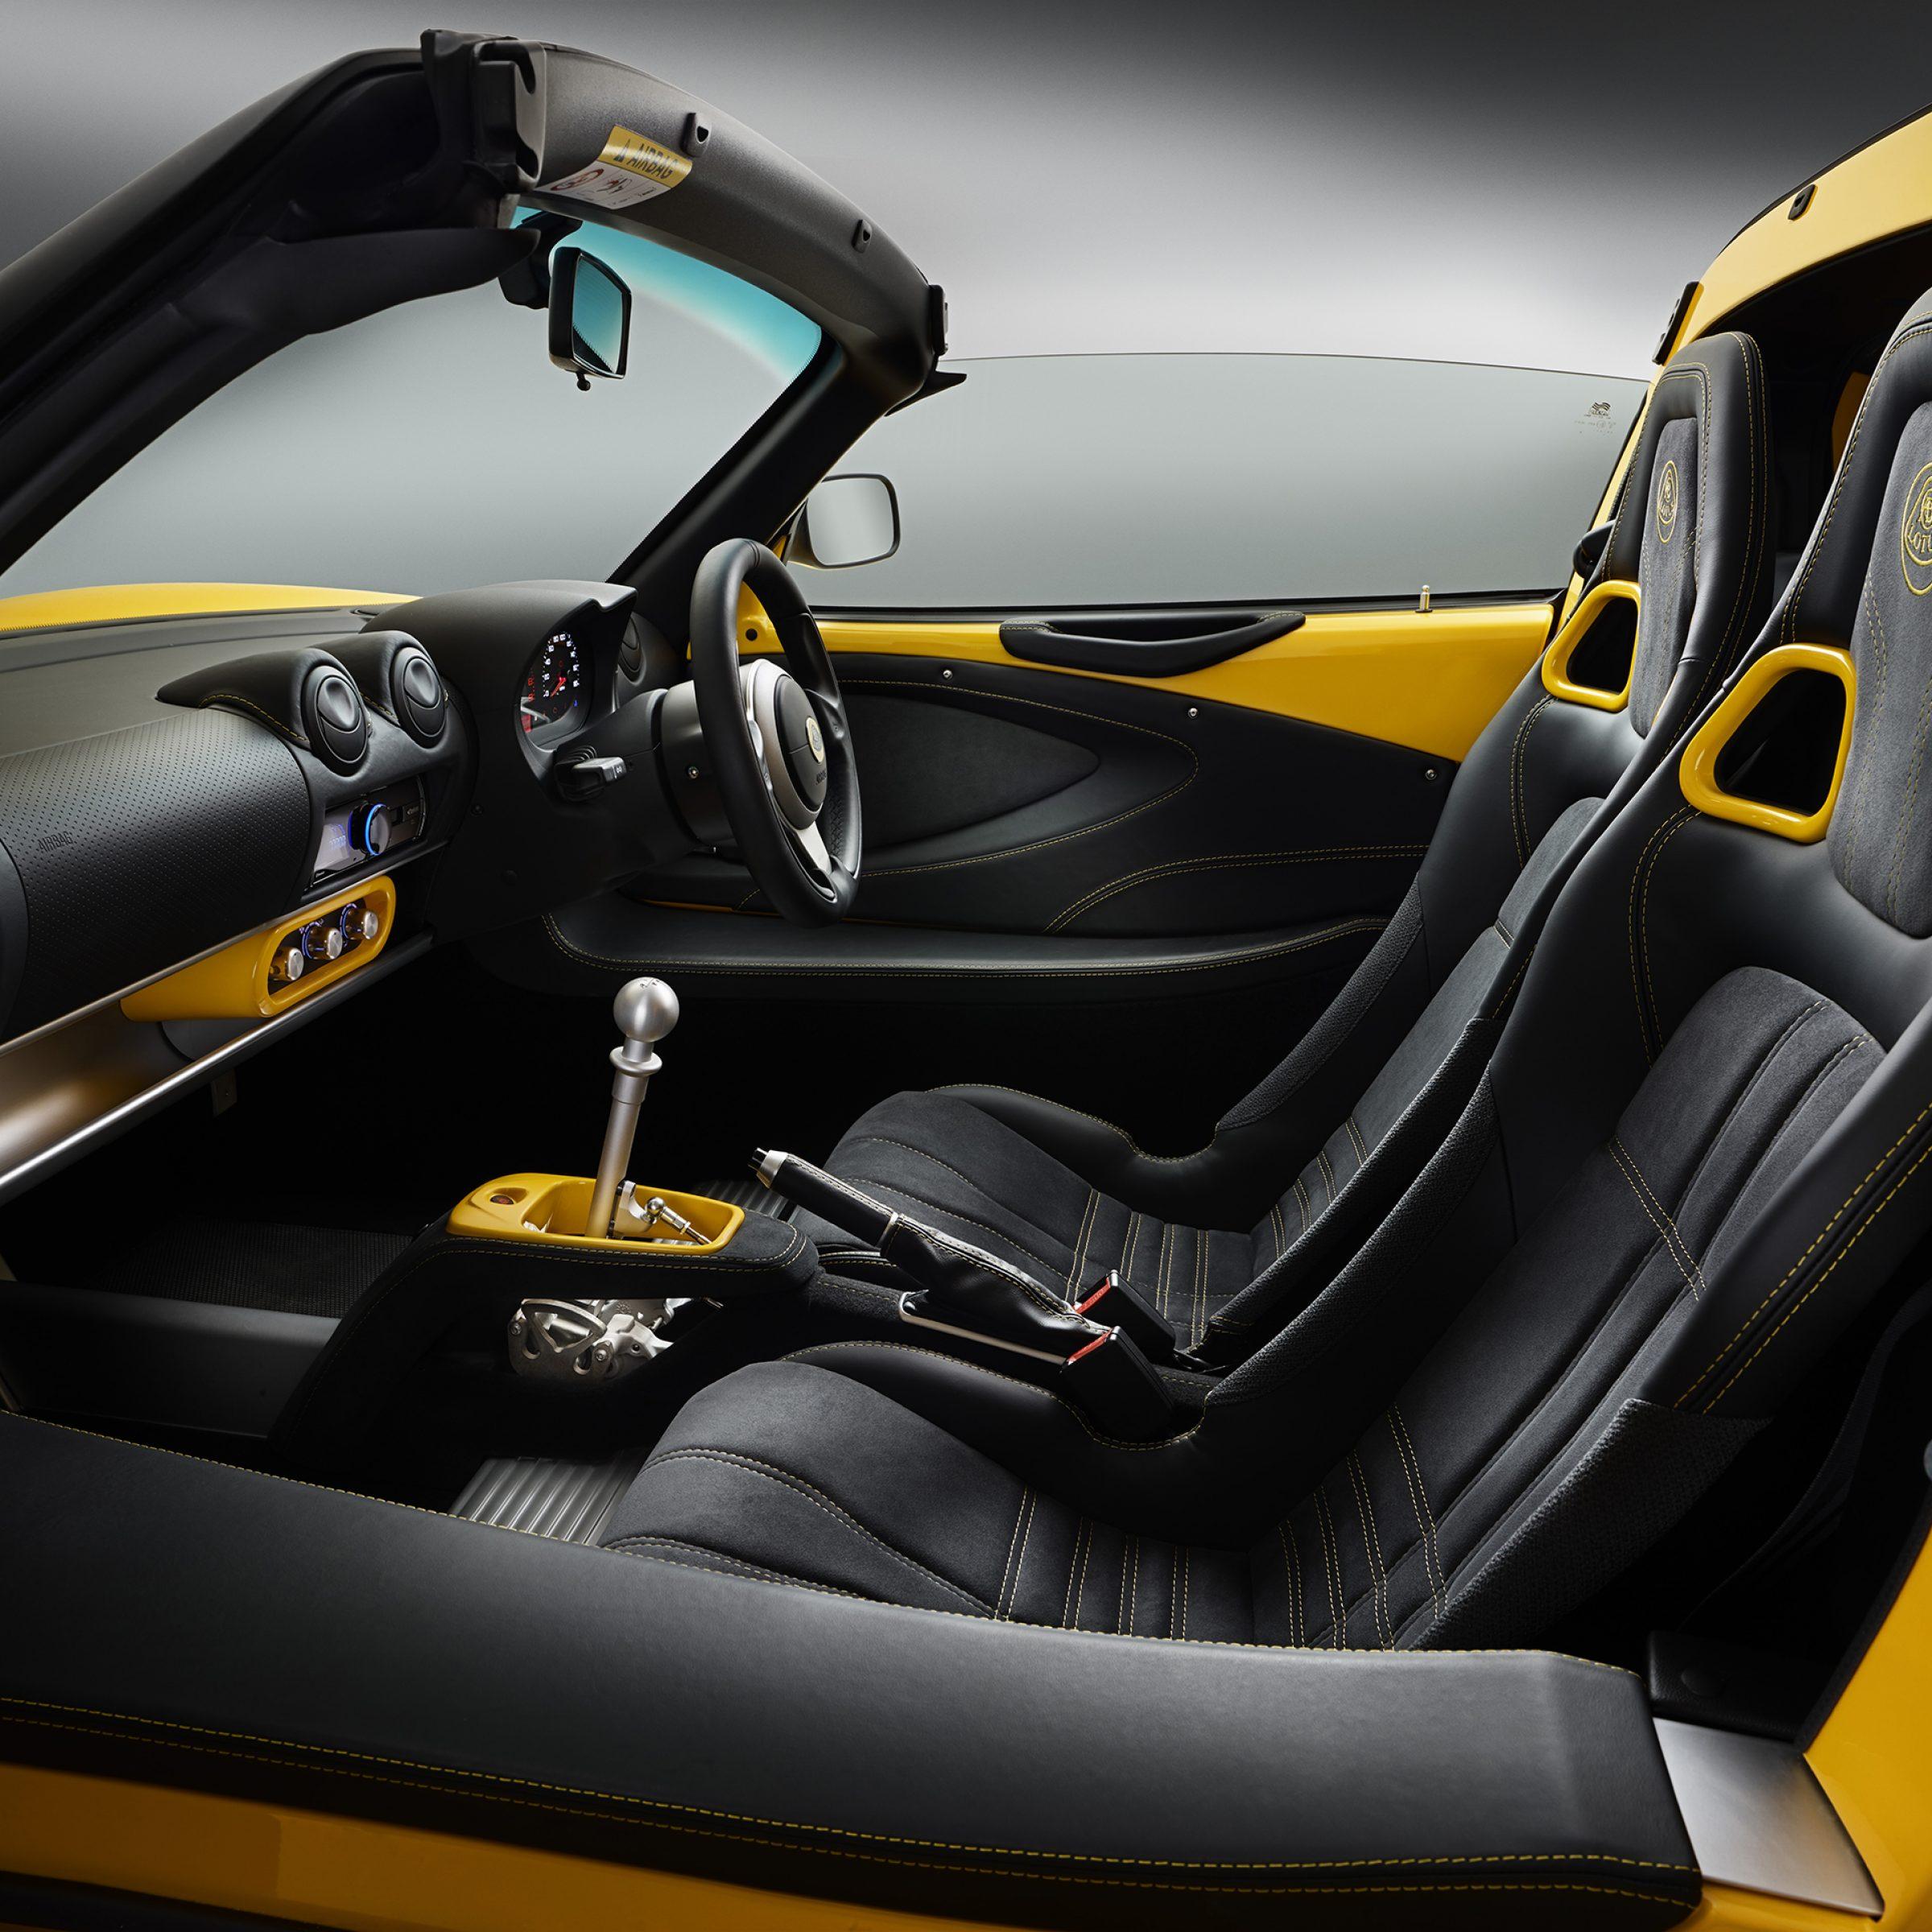 The Lotus Elise Sport 220